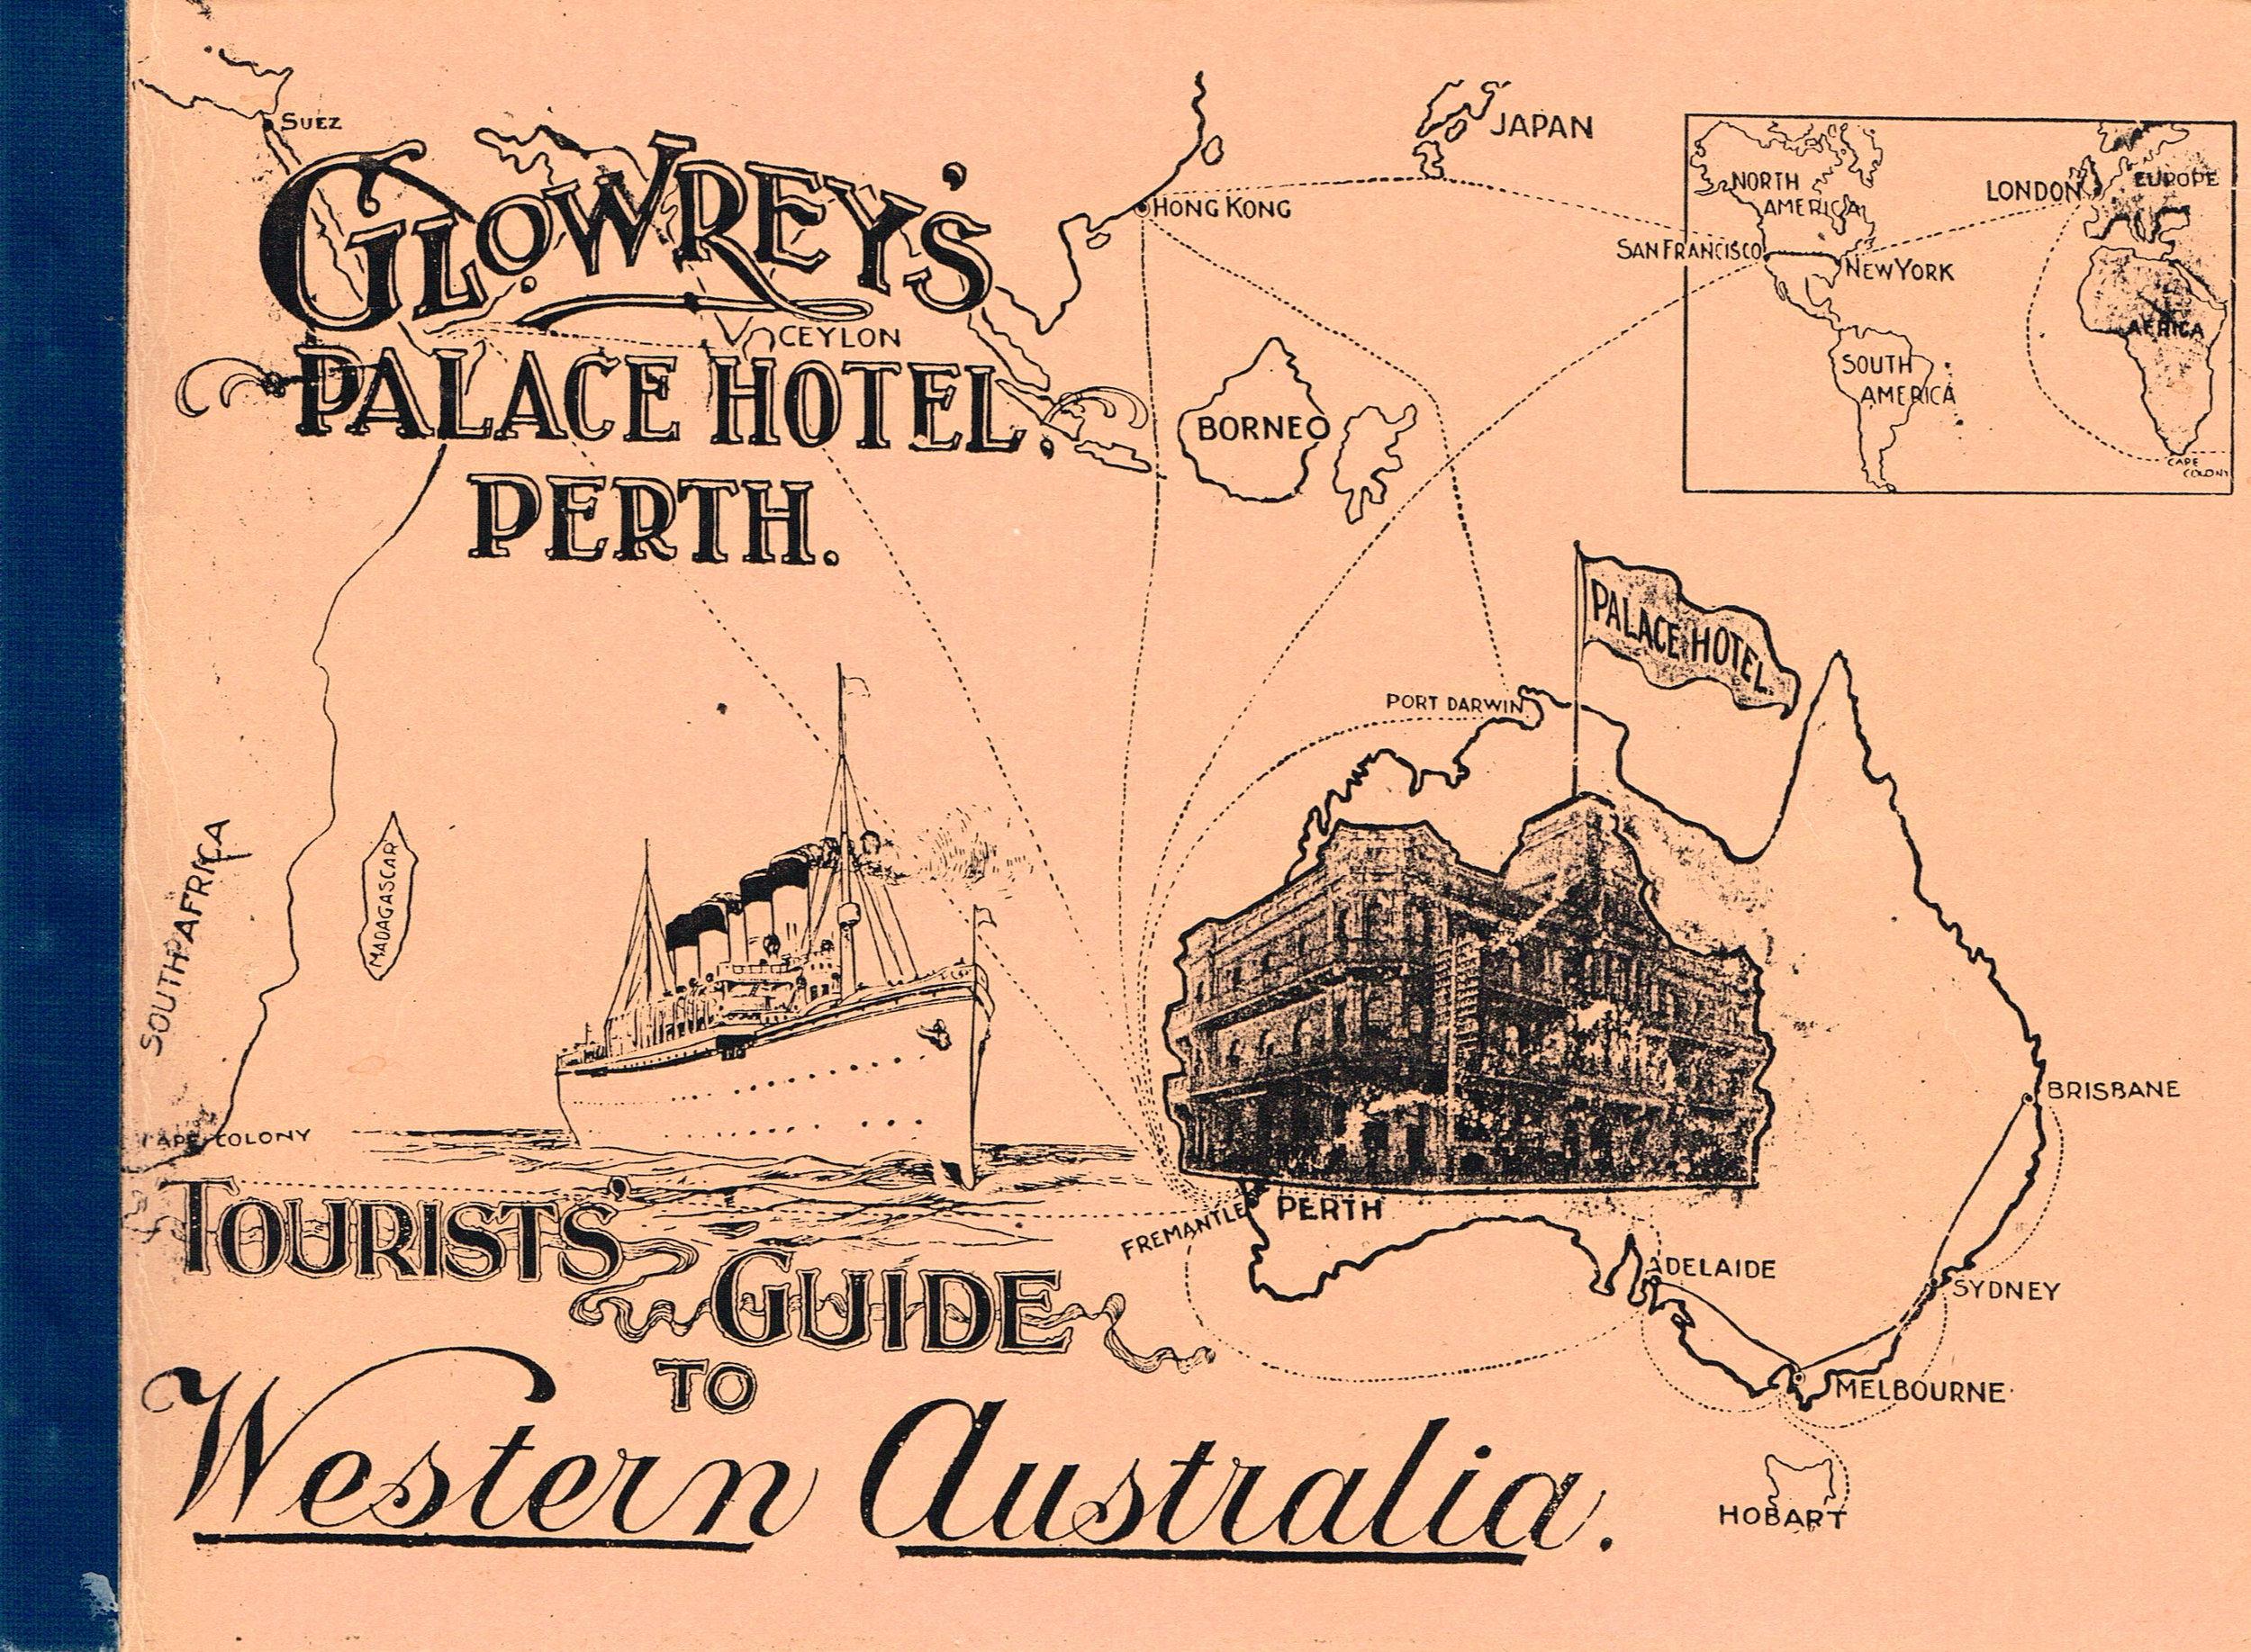 Glowereys_Place_Hotel_Perth.jpg